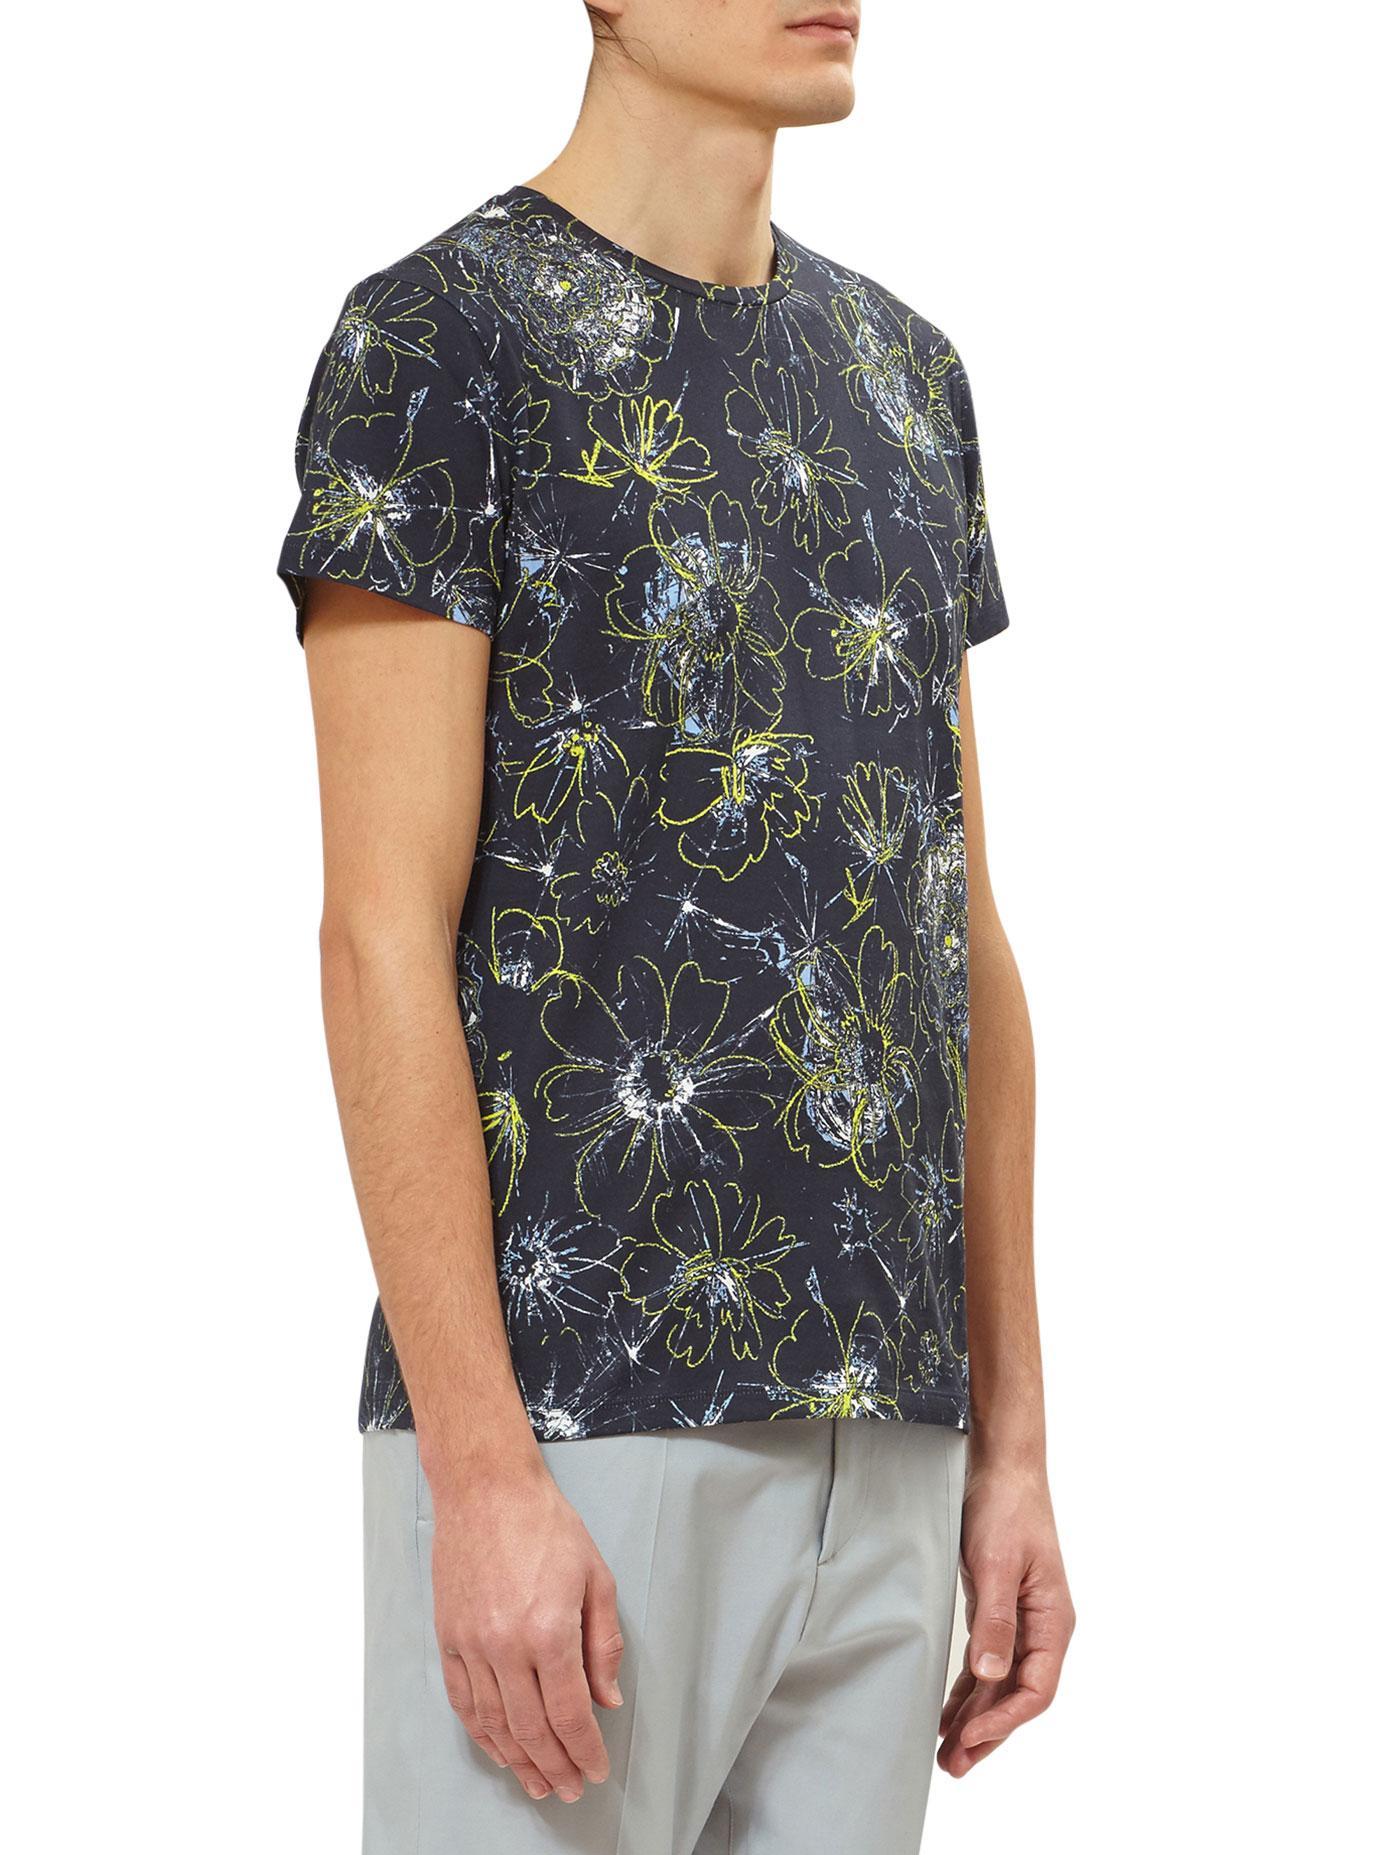 Lyst Jil Sander Printed Cotton T Shirt In Blue For Men